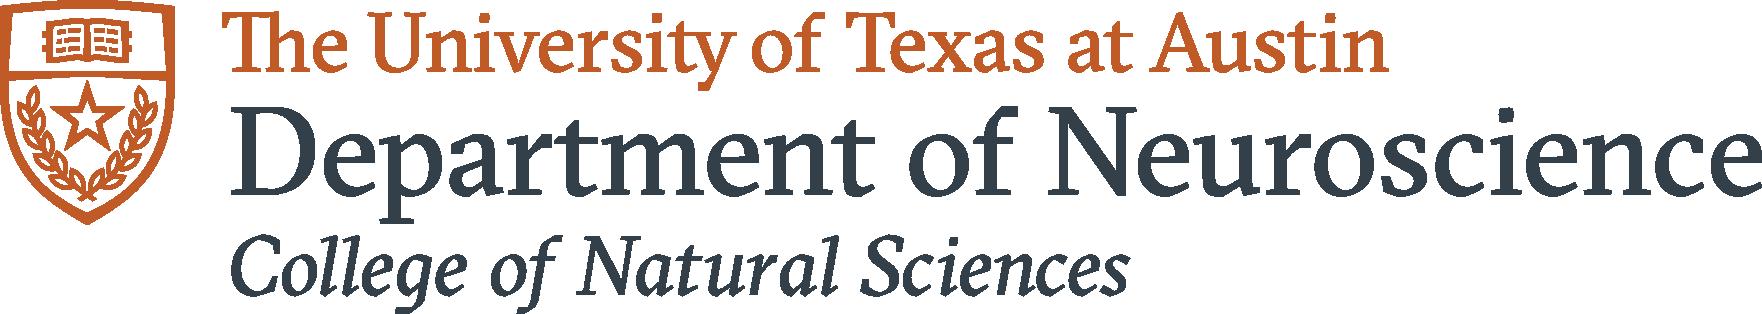 University of Texas Neuroscience